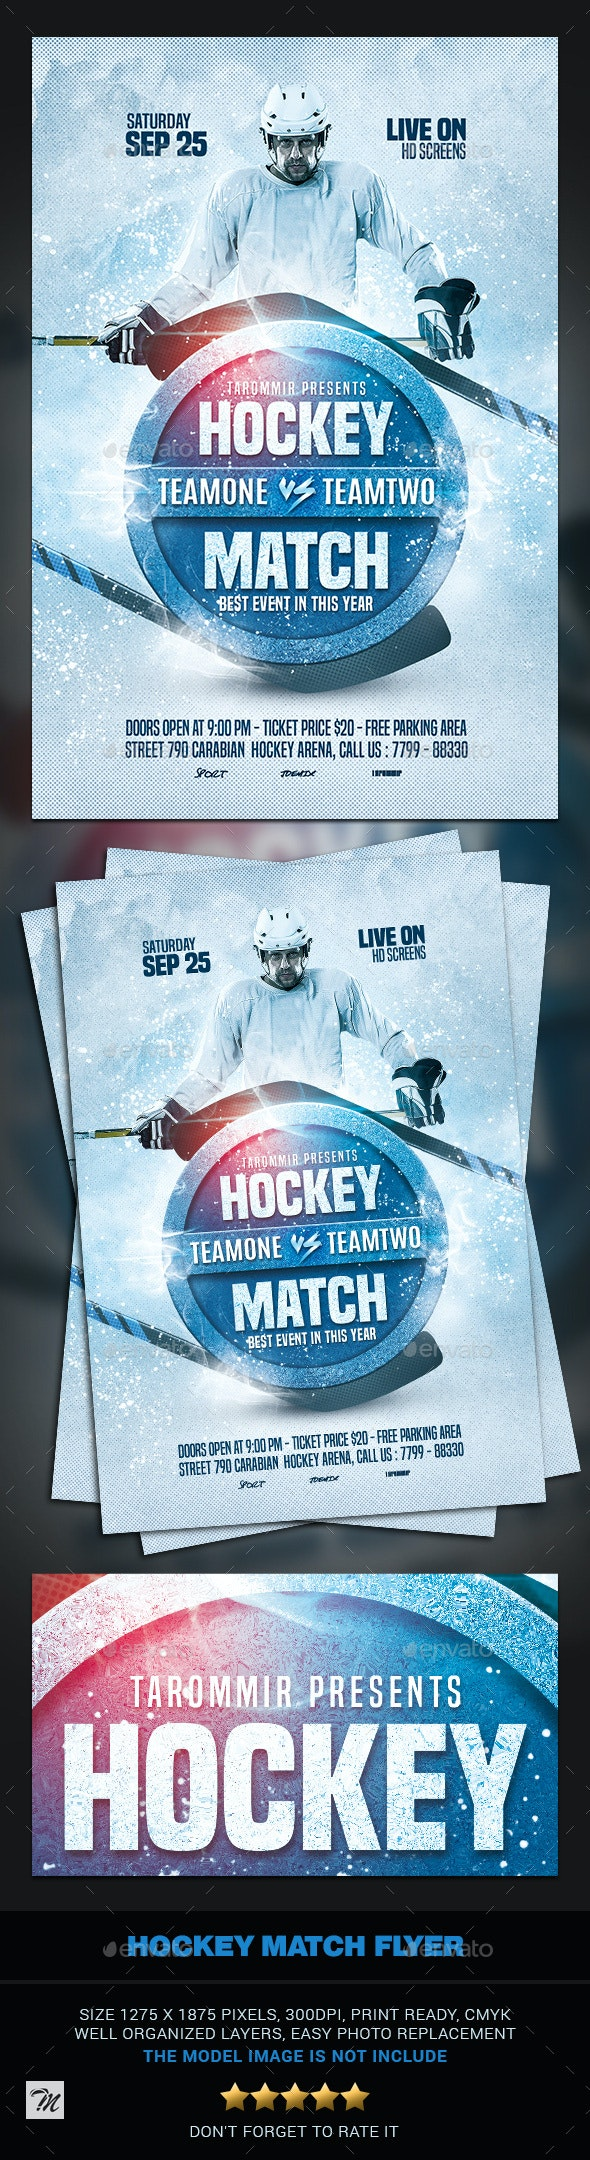 Hockey Match Flyer - Sports Events